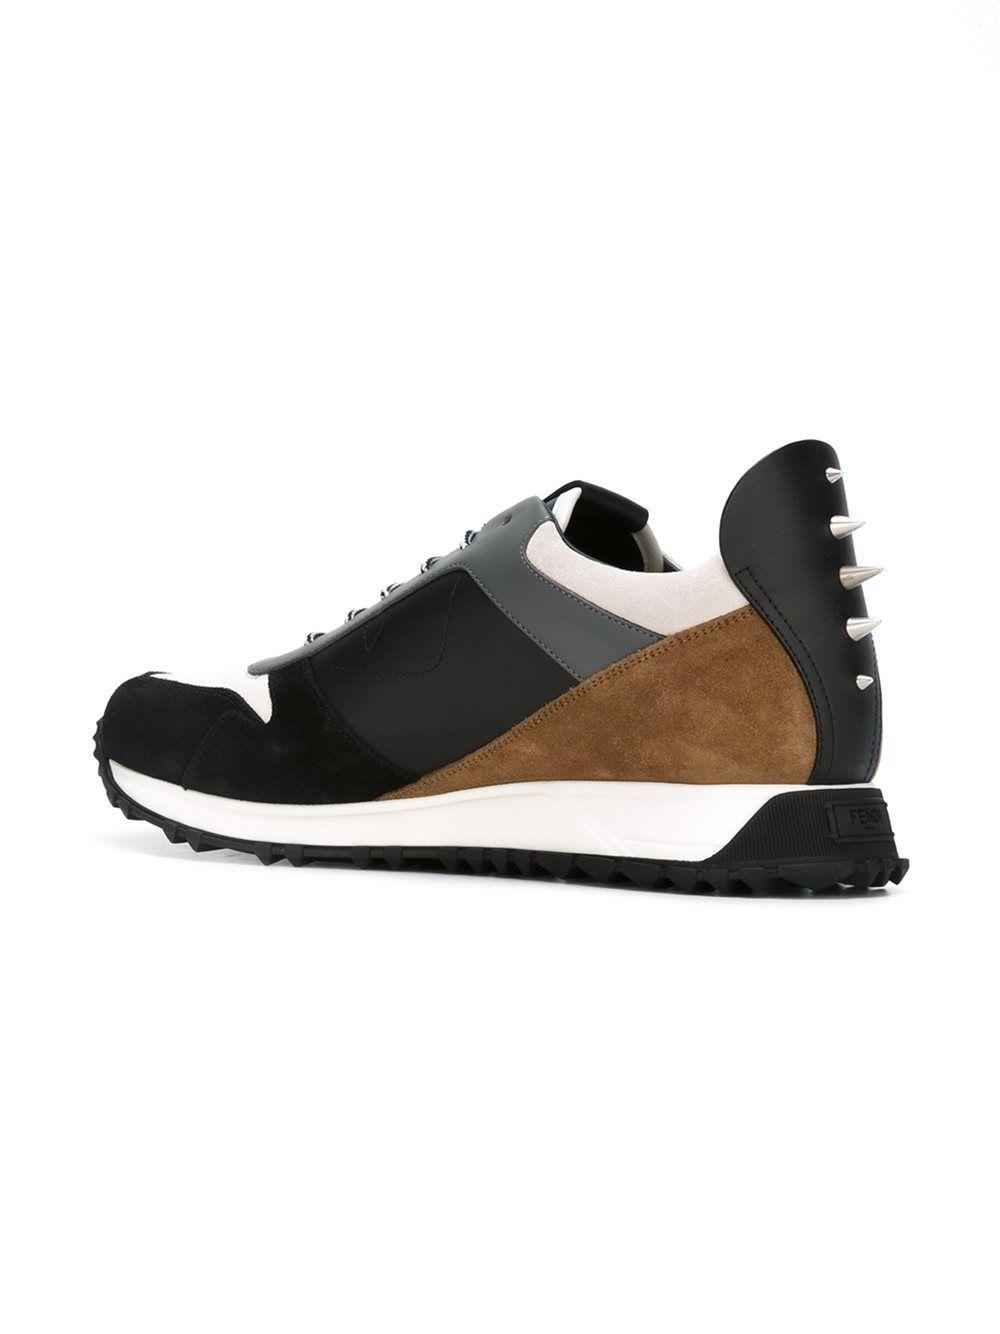 Bag Bugs contrast sneakers - Black Fendi IyHci7m